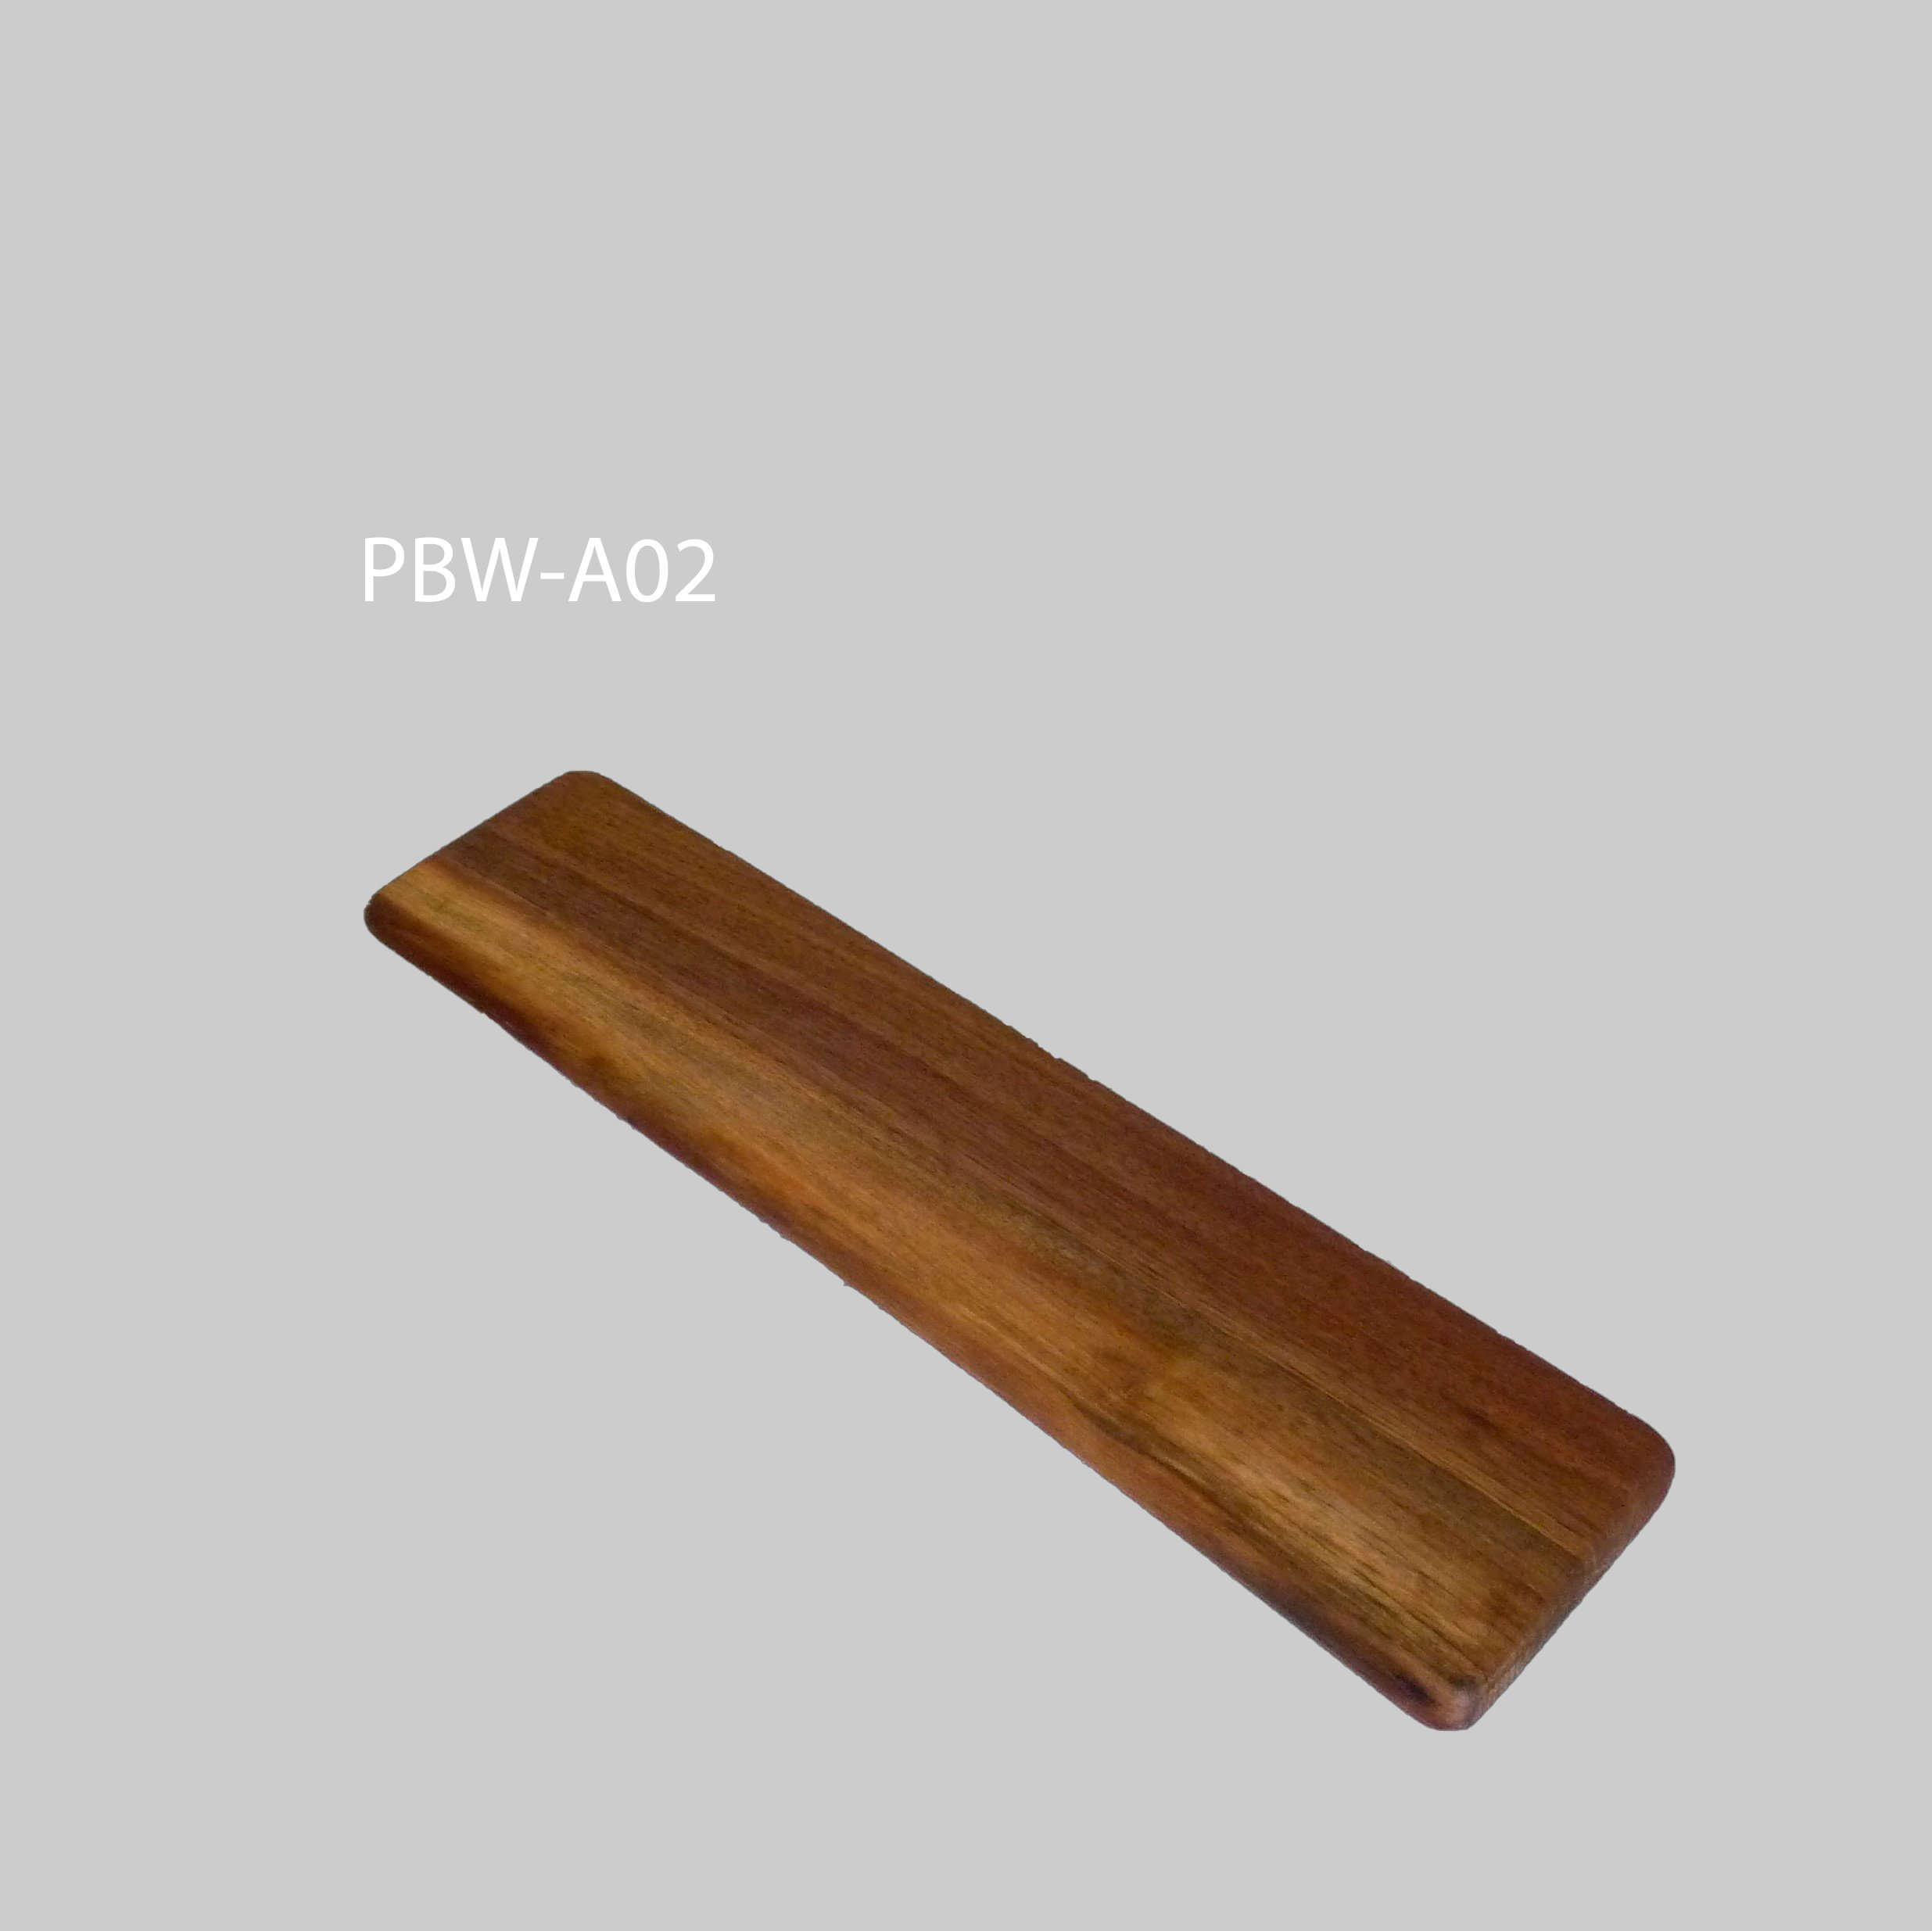 PBW-A02